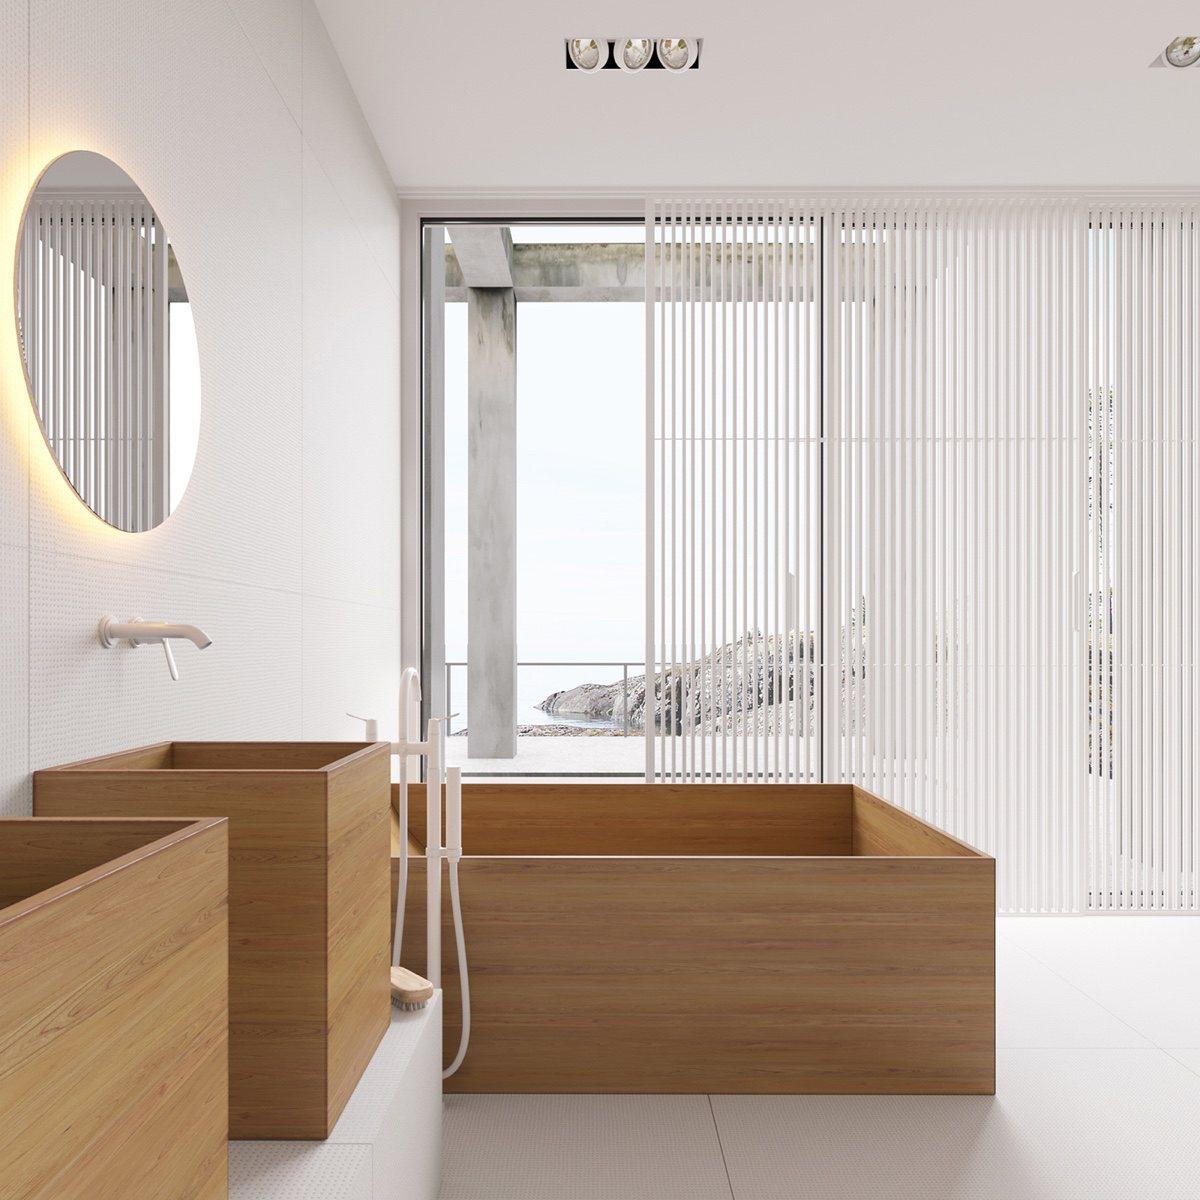 organic-bathtubs-and-sinks